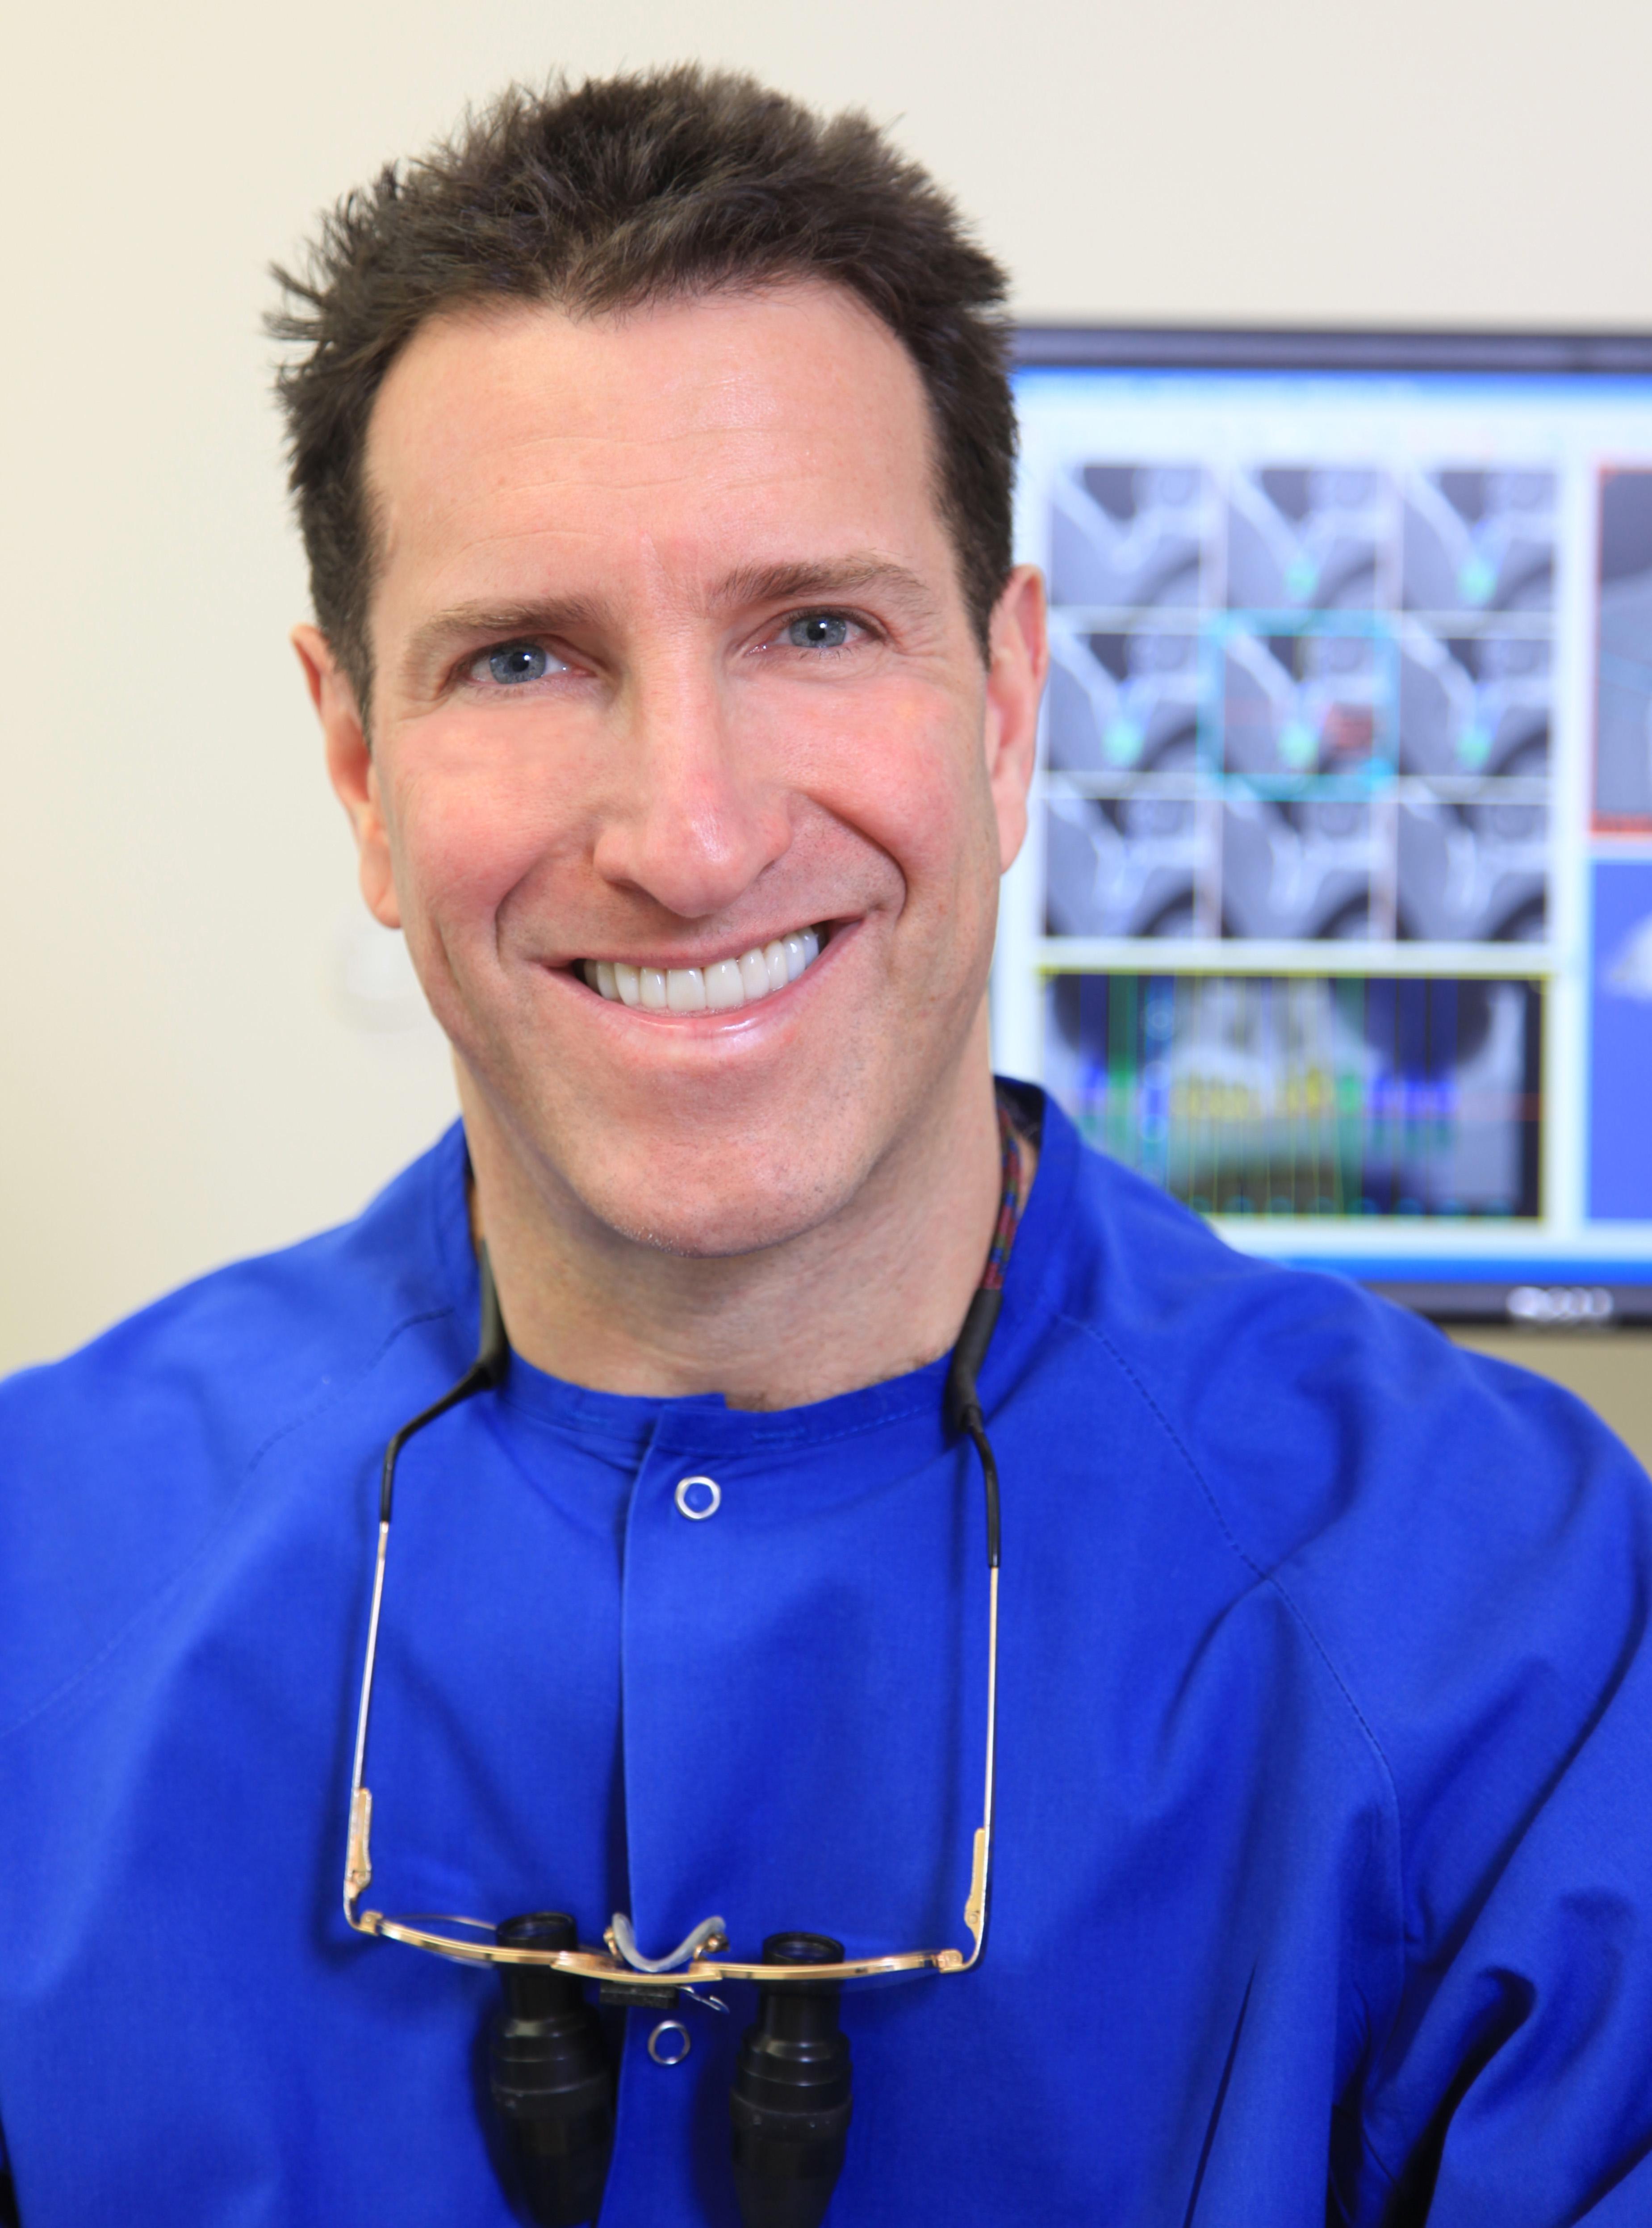 Tischler and Patch Dental image 1